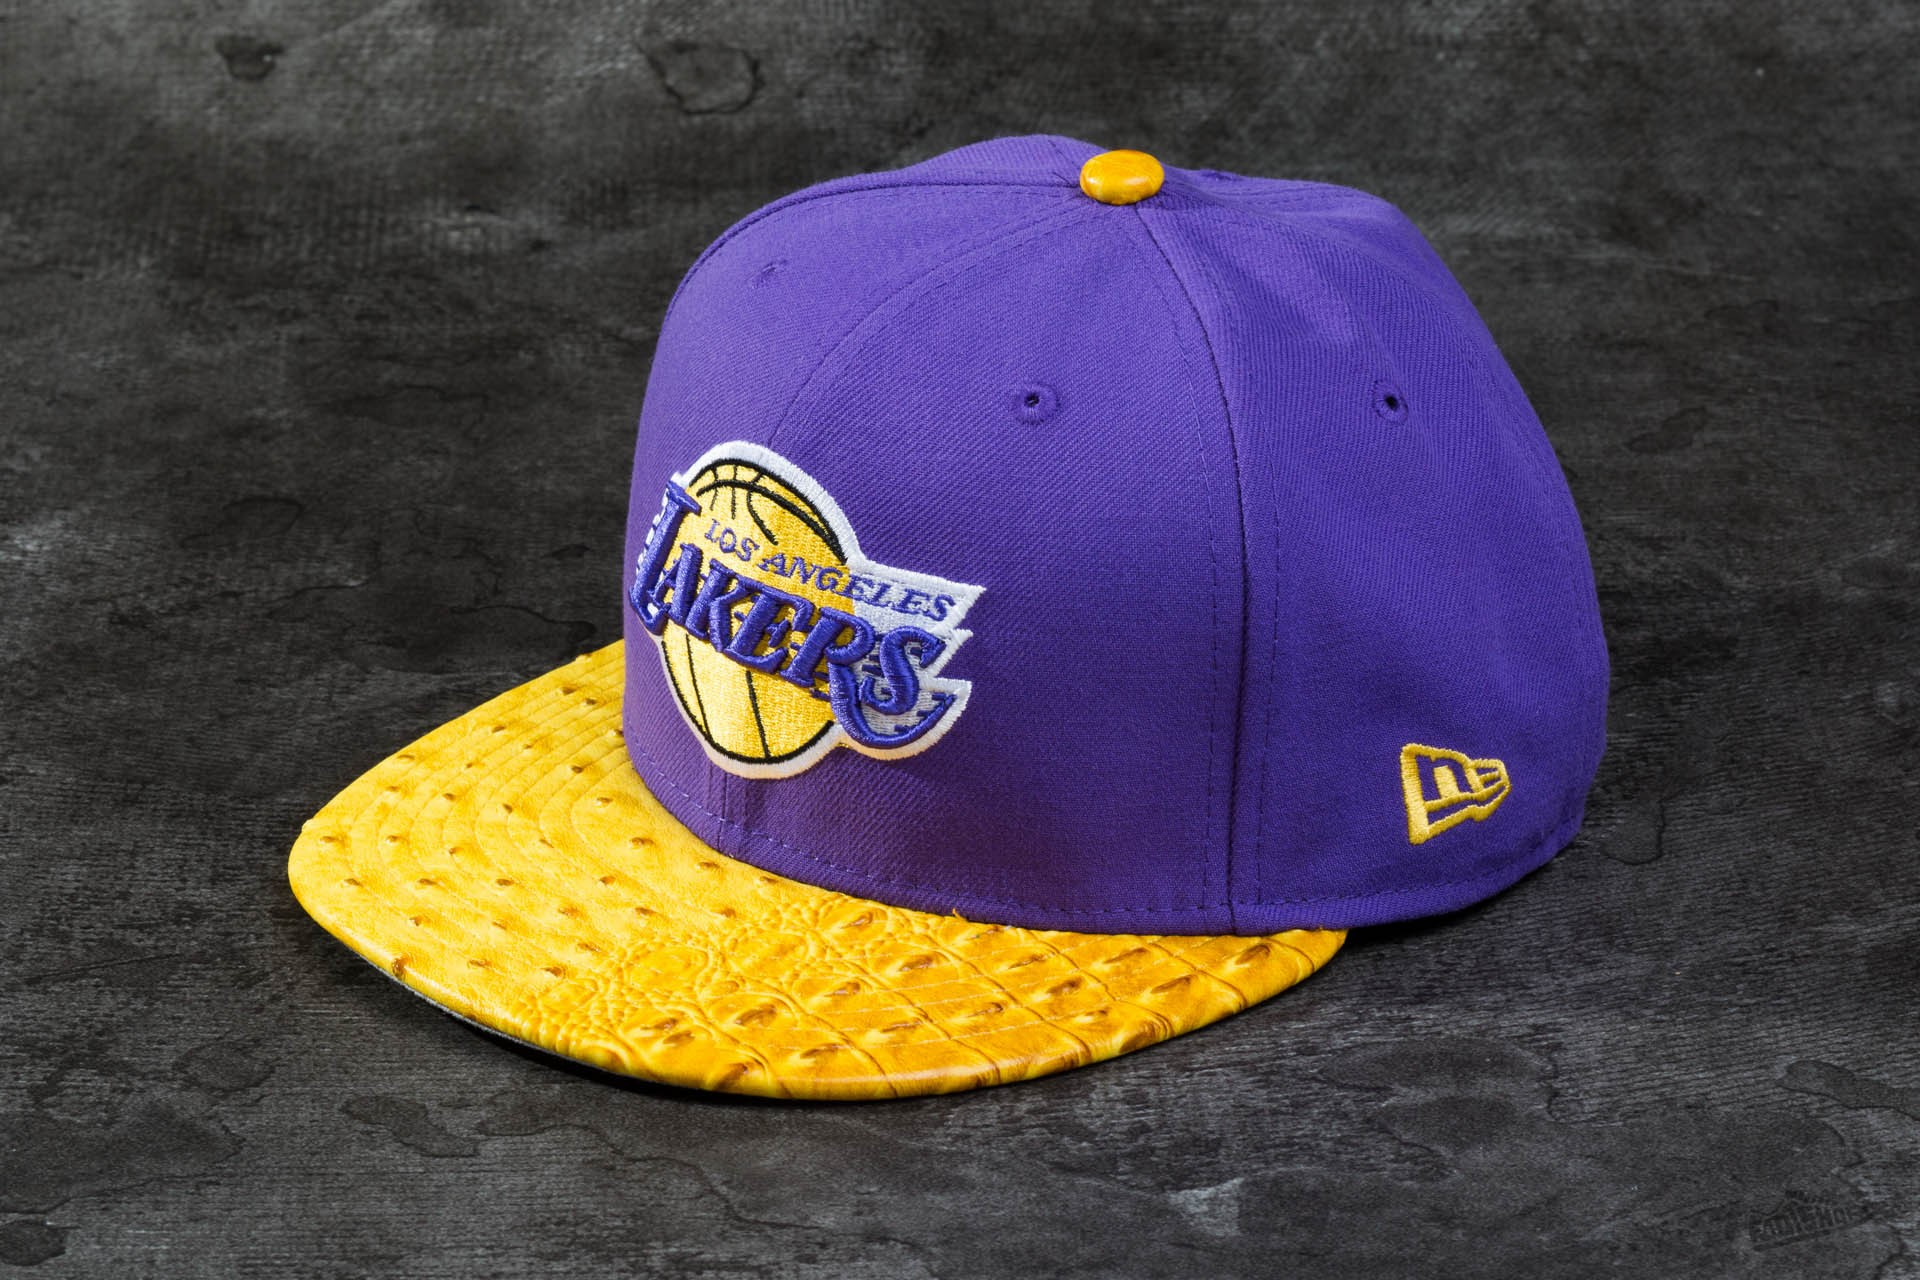 New Era 59FIFTY Reptile Mix Loslak Lakers - 1613